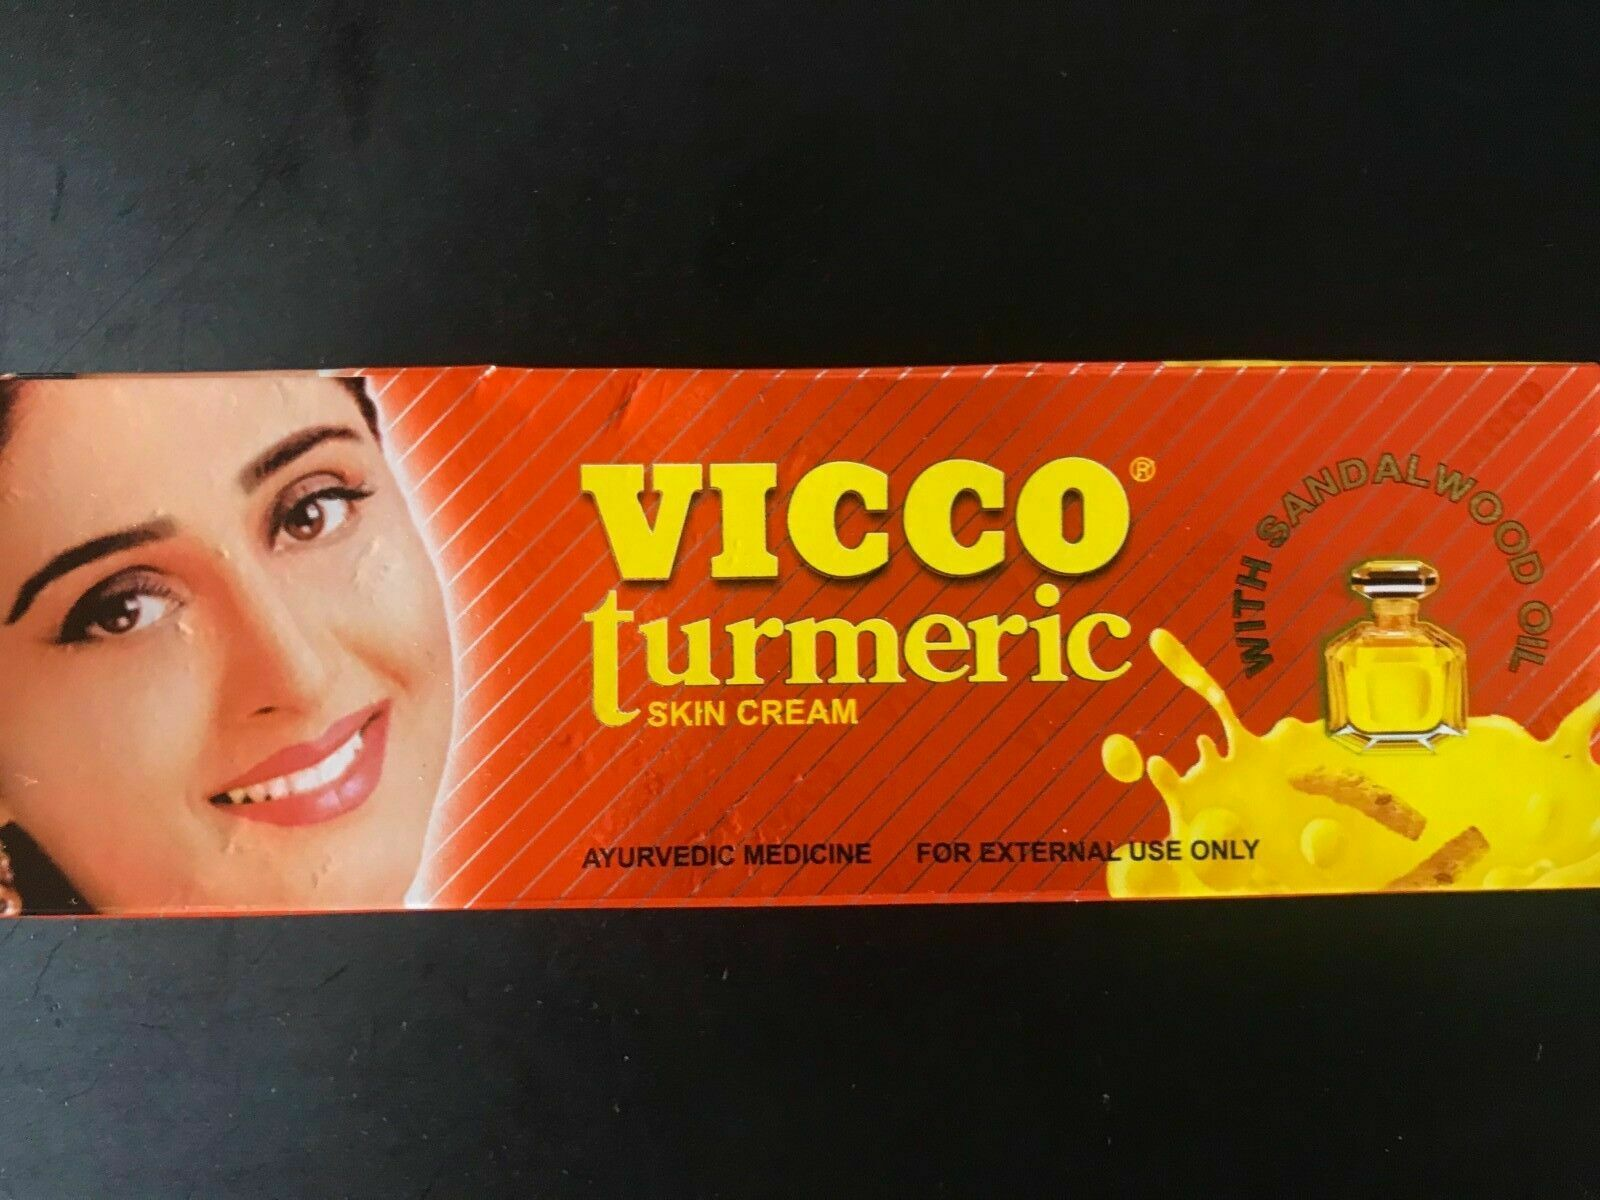 Vicco Turmeric Cream (Ayurvedische Haut-Creme mit Sandelholzöl) 50g Neu Verpackt